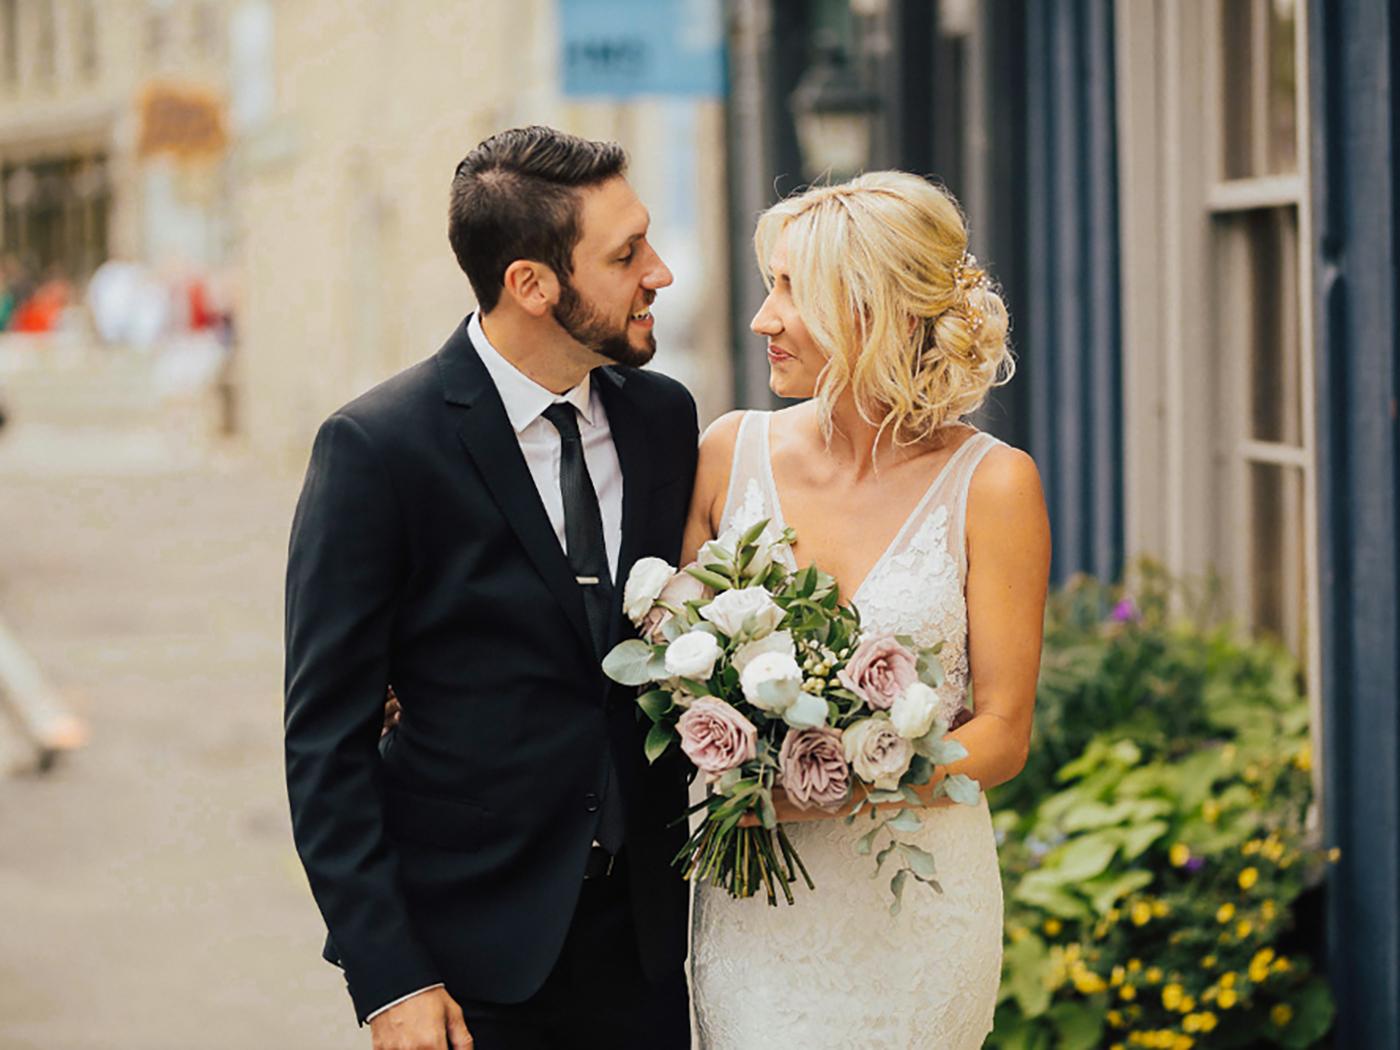 Brett & Andrea's Wedding Elora Mill Pearle Weddings Aidan Hennebry Hush Hush Wedding Films Photography & Film Hamilton Ontario Toronto Videographer Videography.jpg